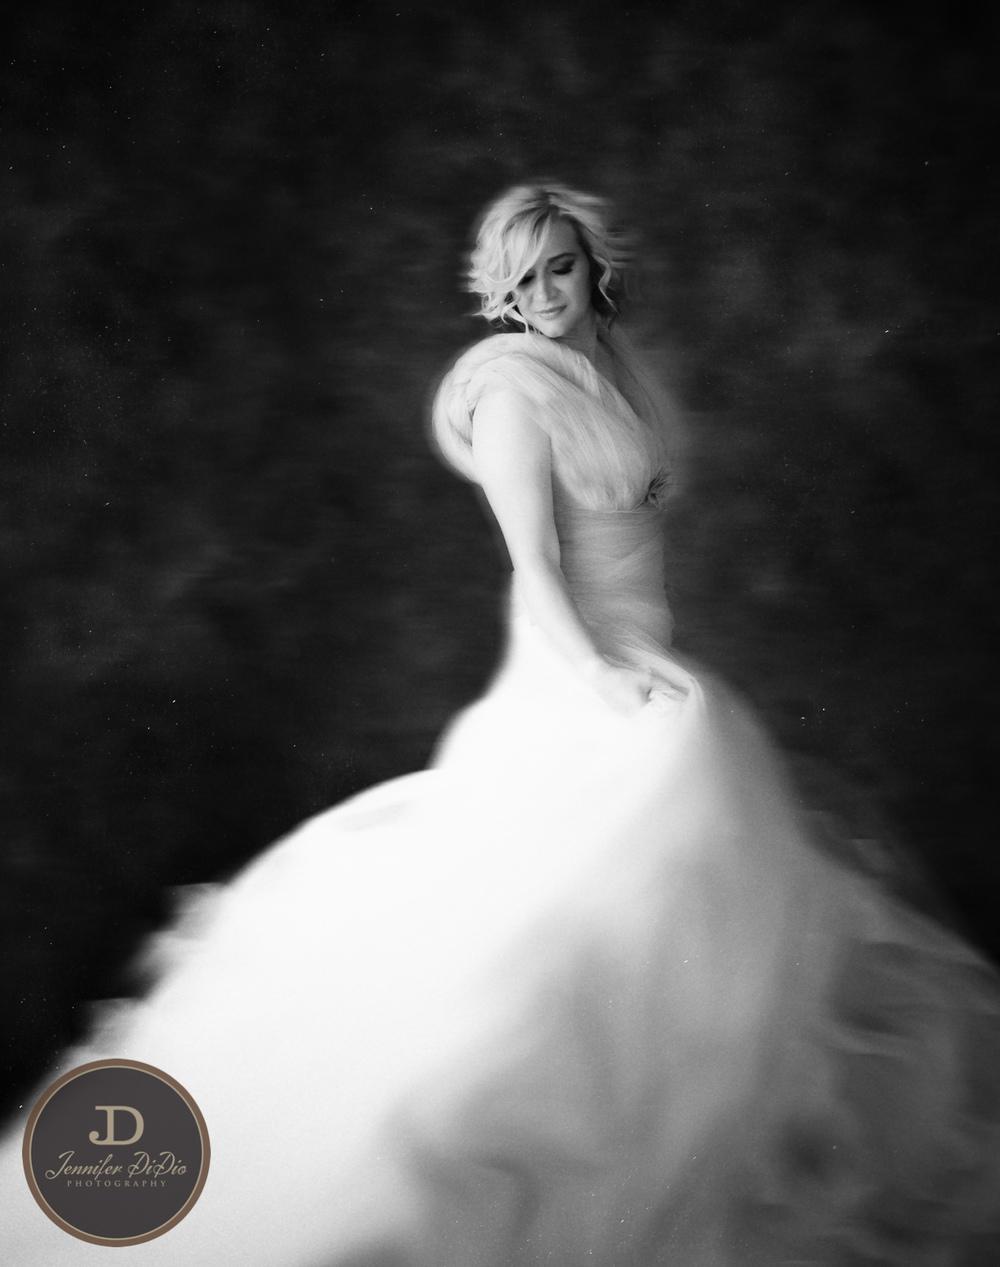 Jennifer.DiDio.Photography.Lanahan.Bridget.2014-162.jpg